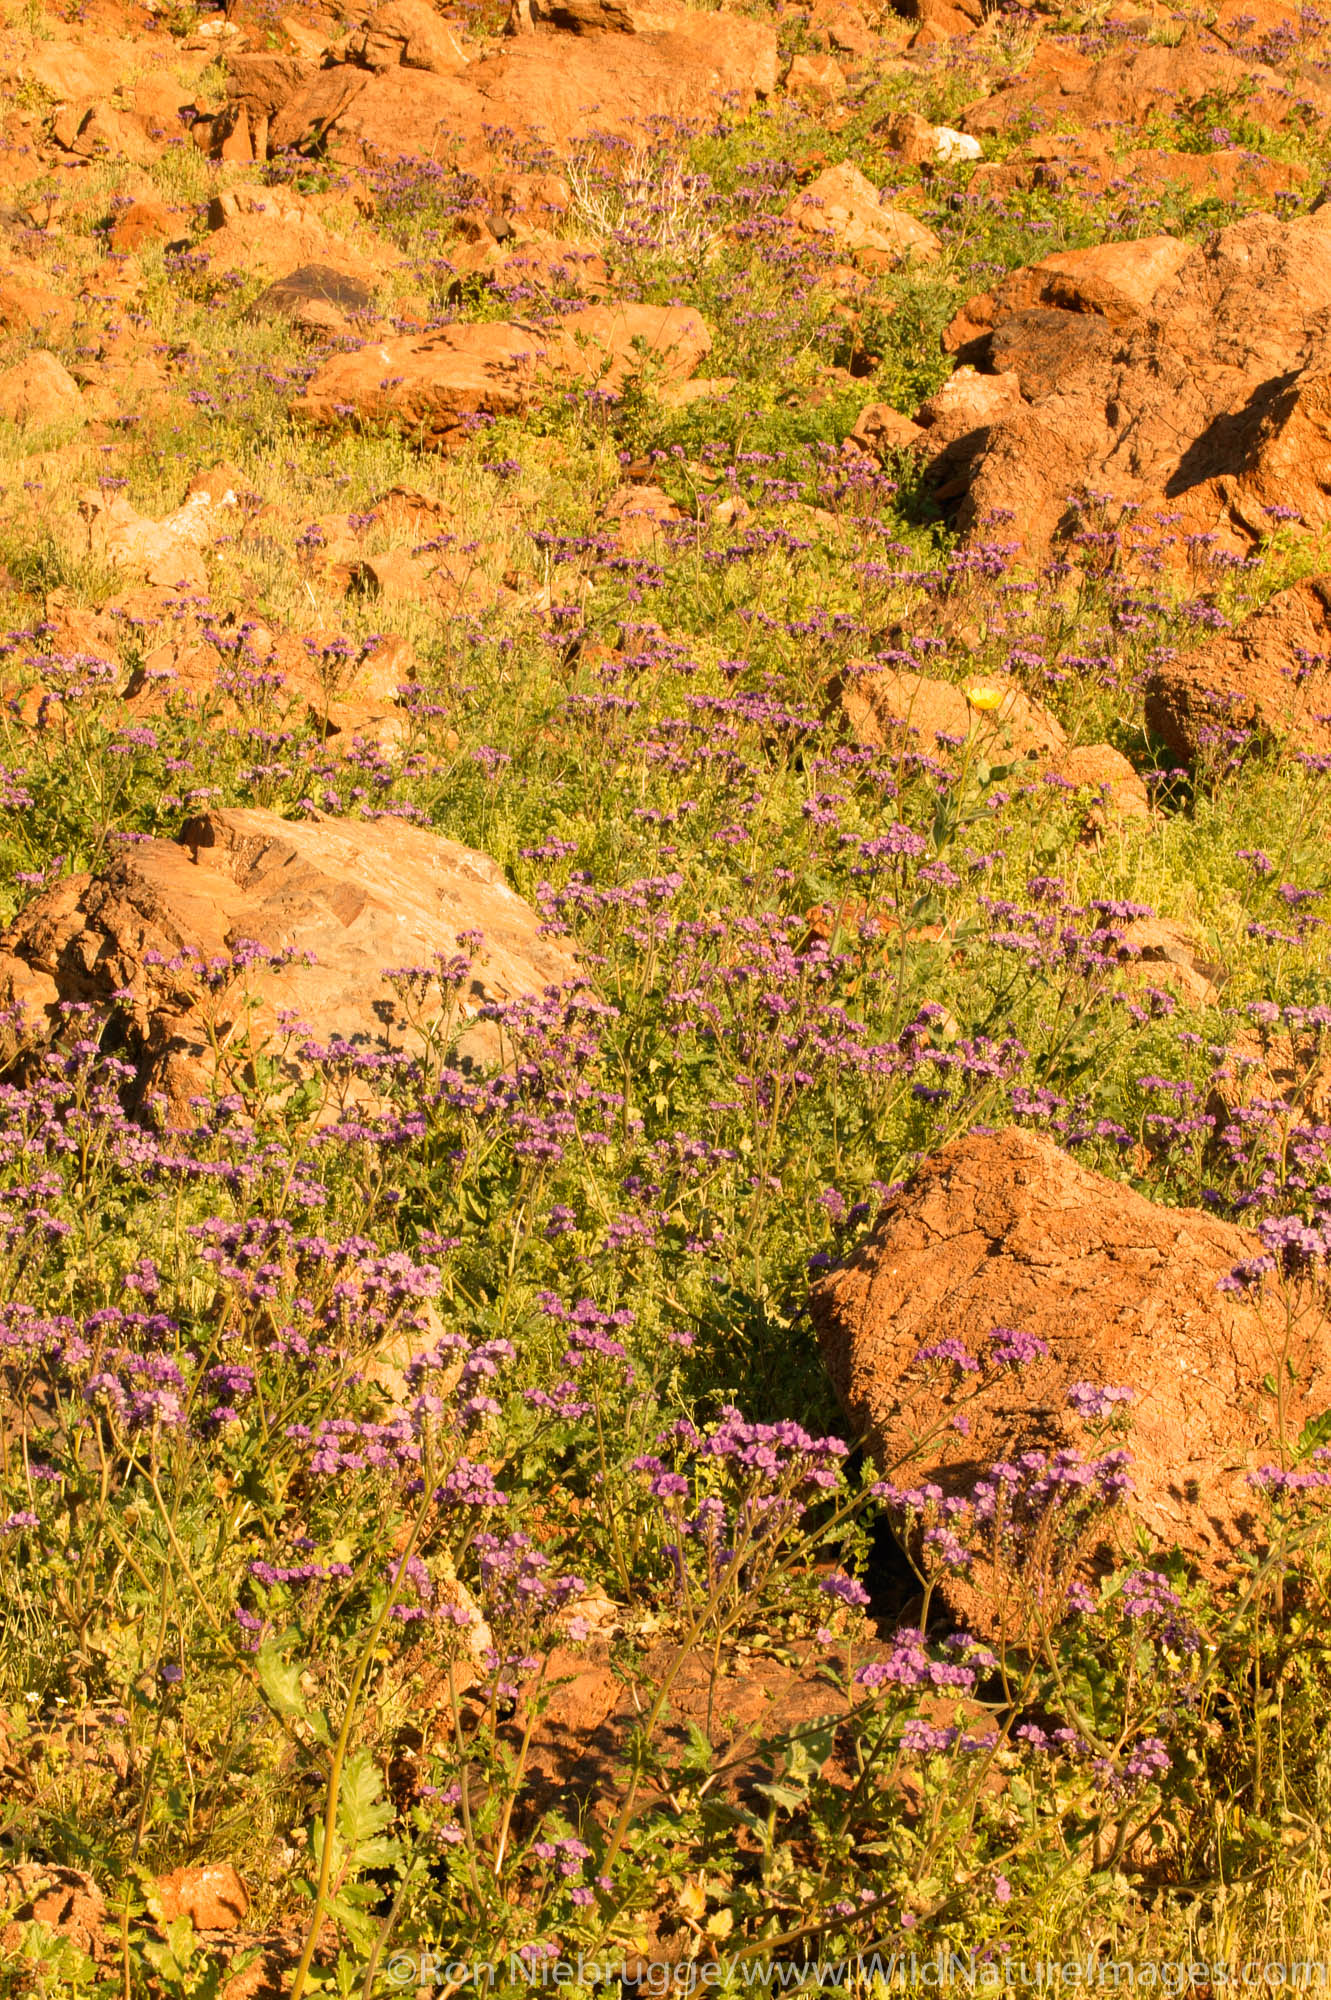 Phacelia, Death Valley National Park, California.